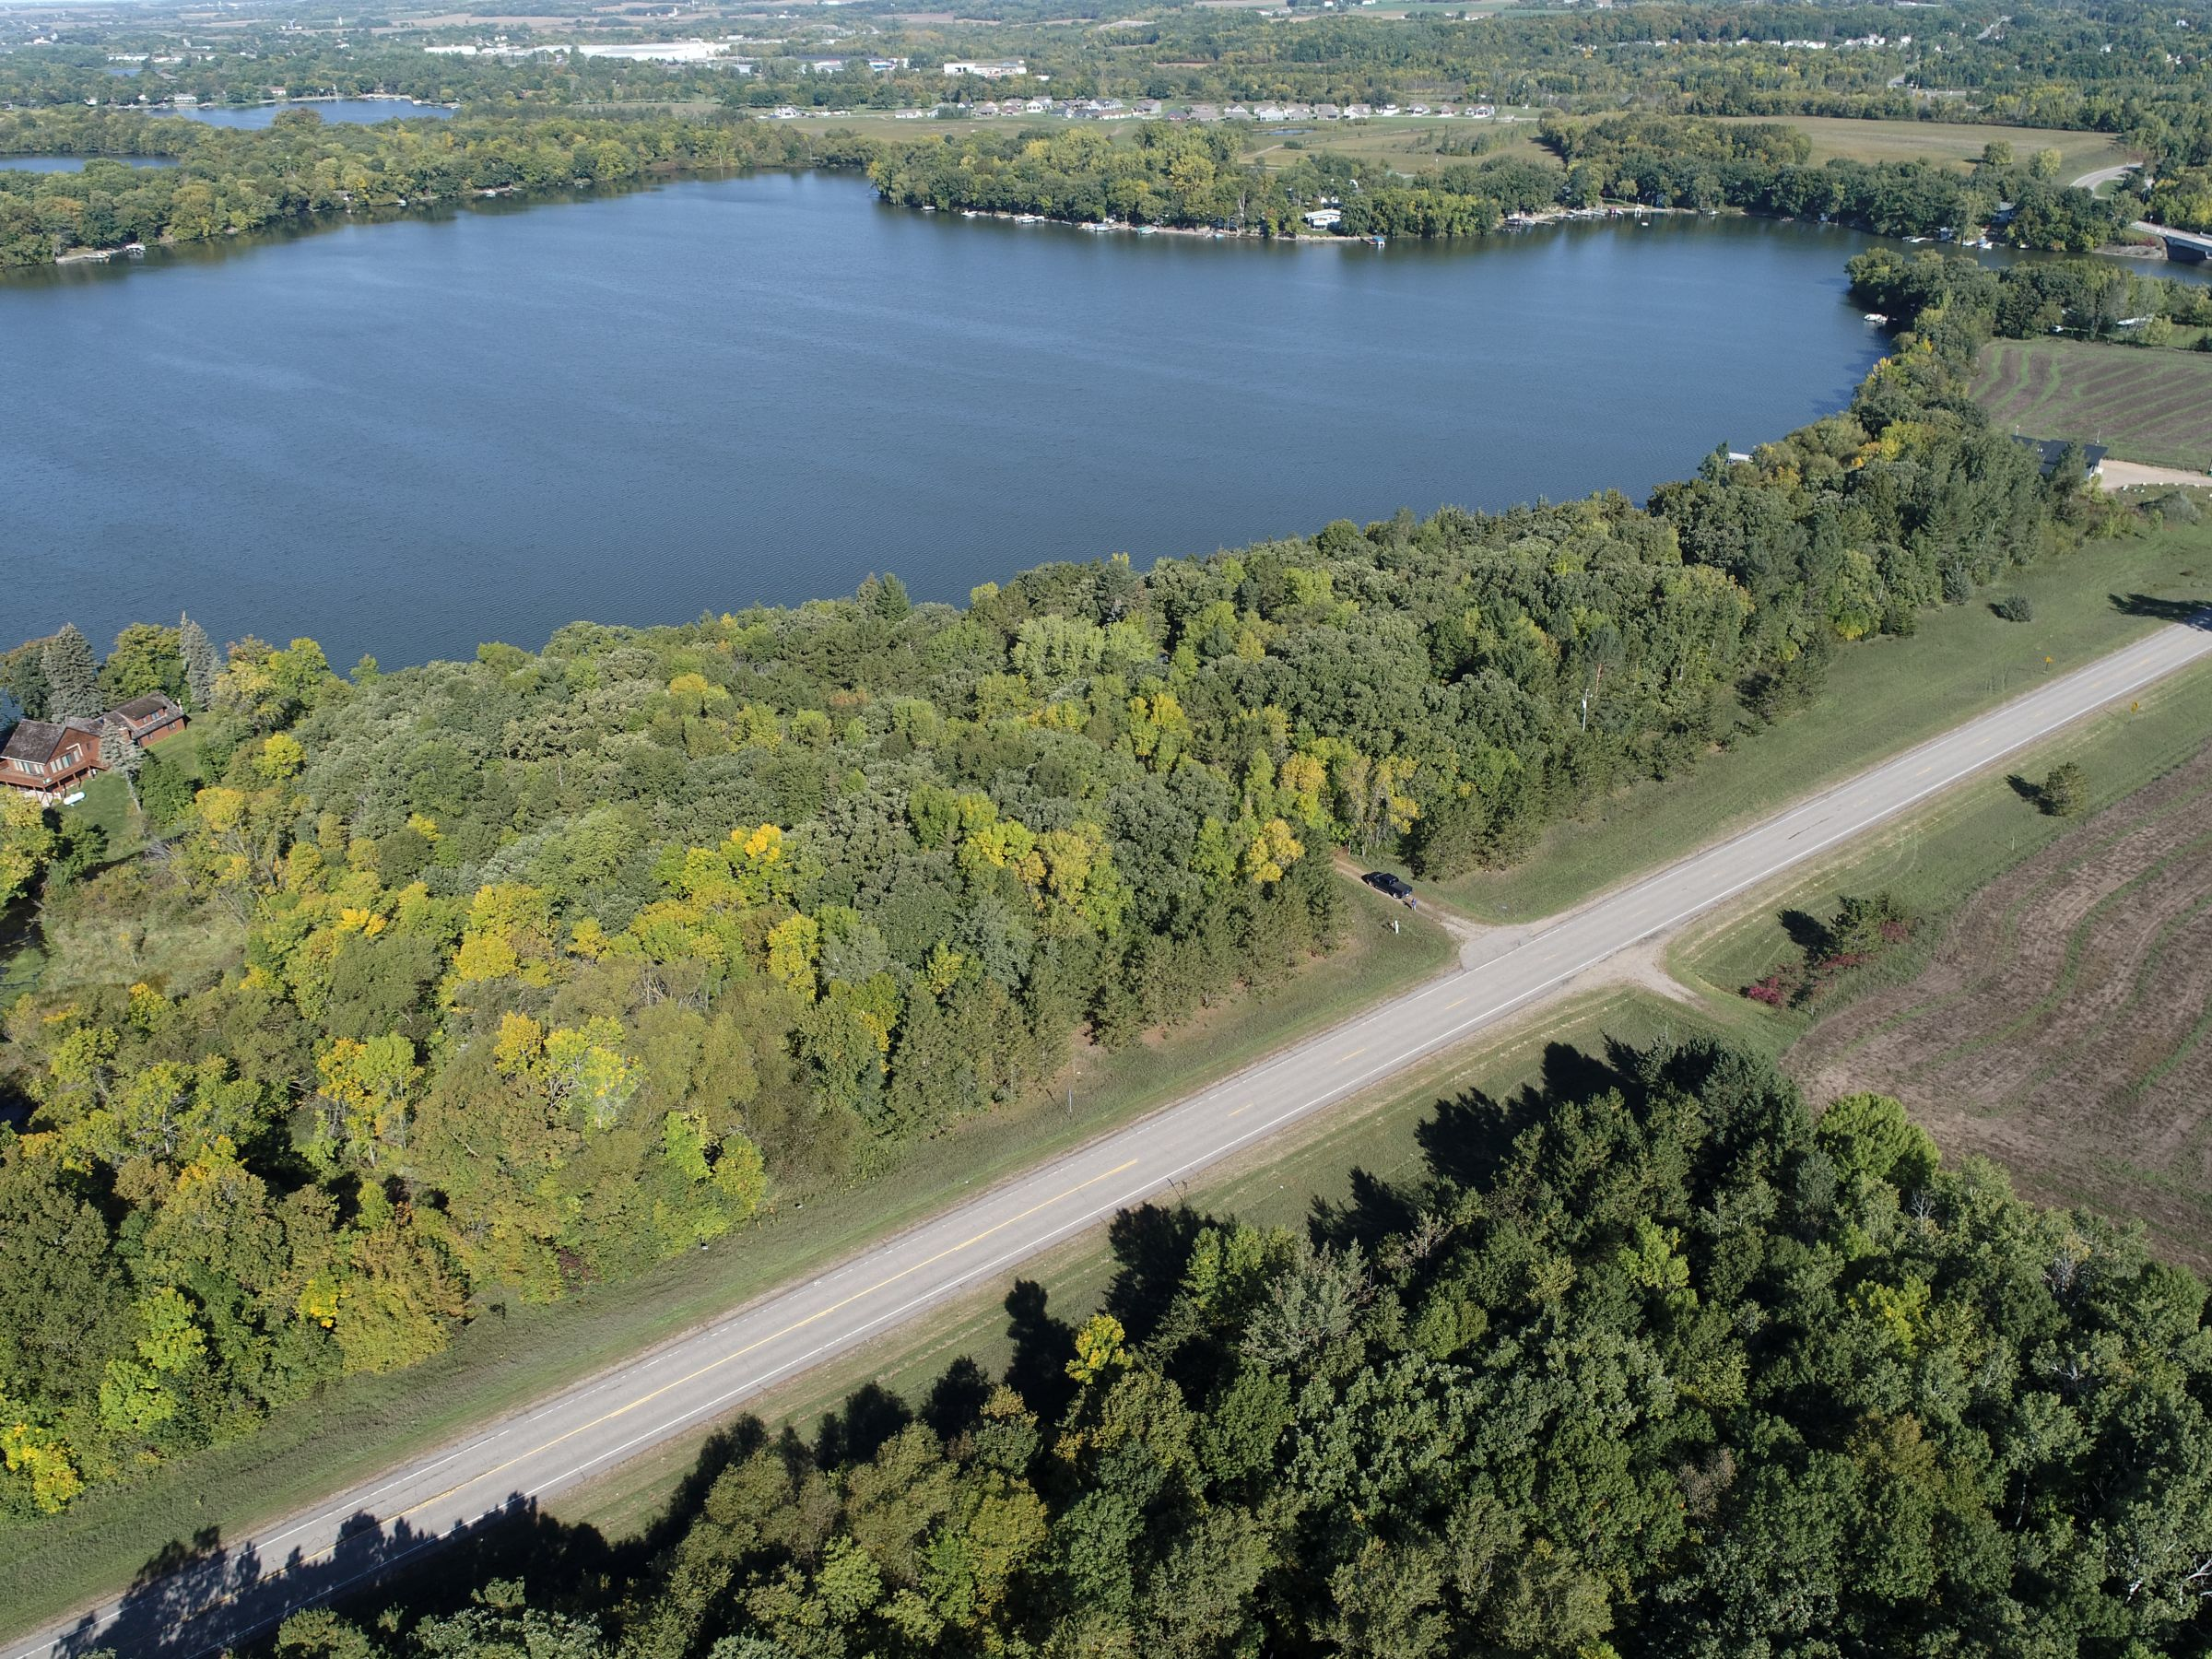 land-stearns-county-minnesota-298-acres-listing-number-15712-0-2021-09-23-131314.JPG